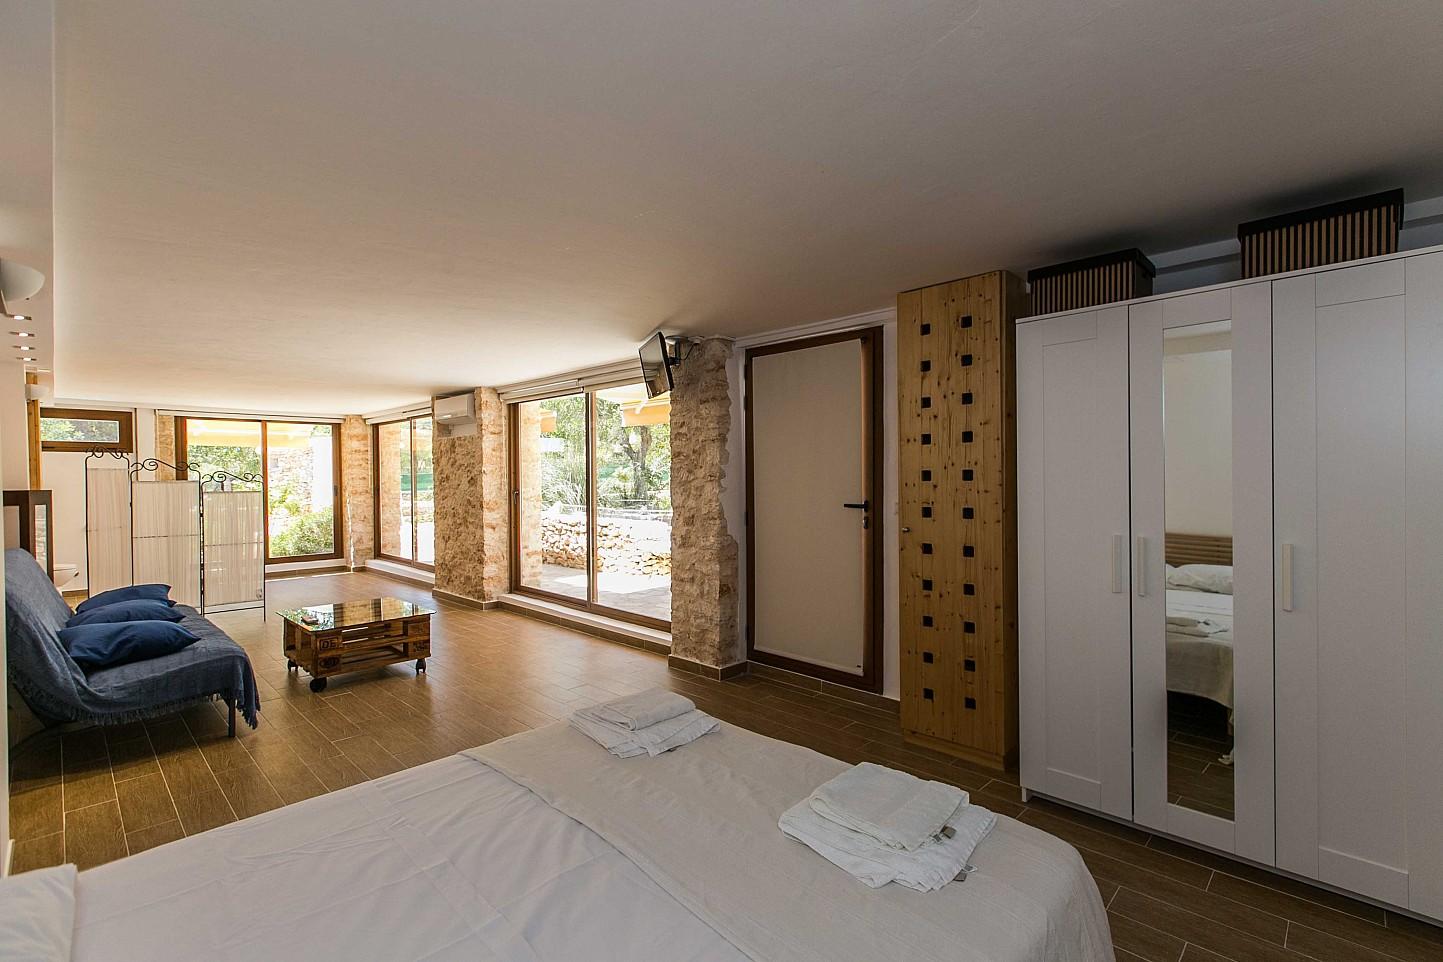 Luminoso interior de estancia en alquiler situada en Ibiza